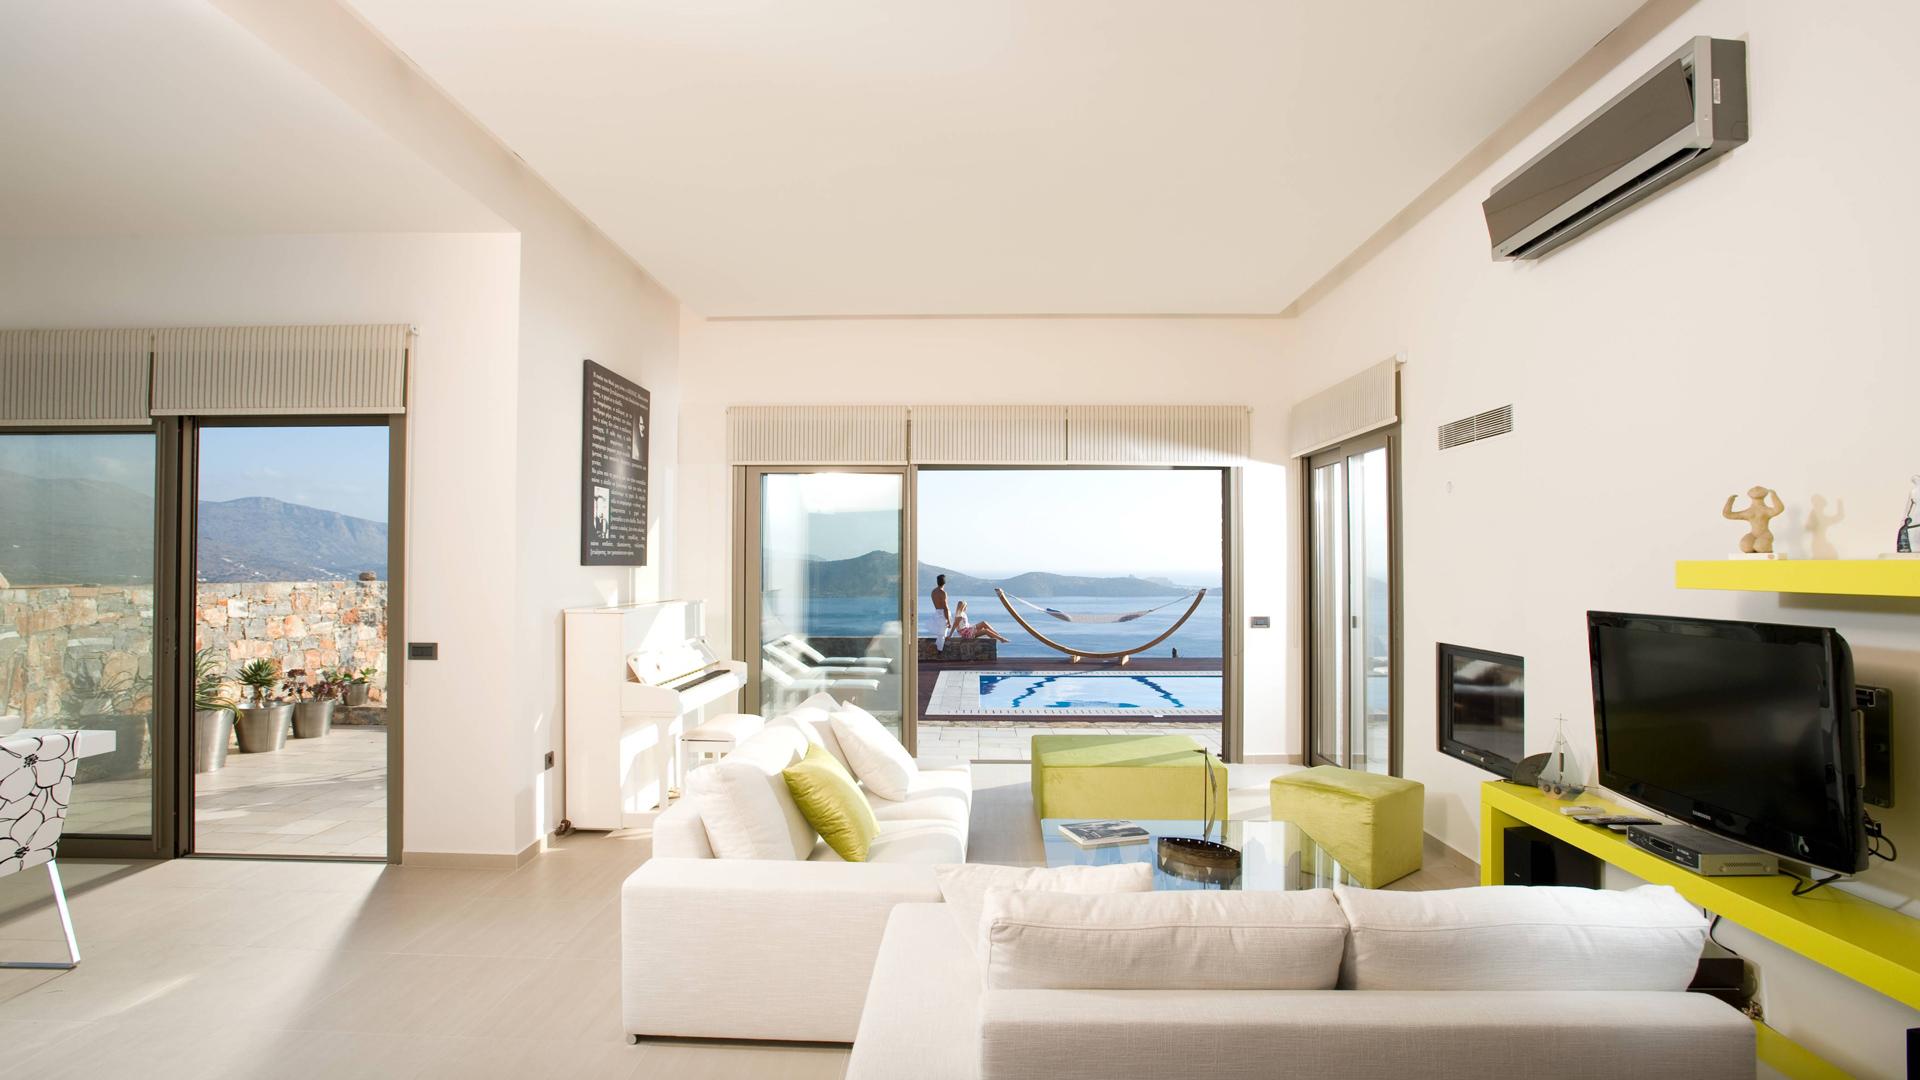 Grece location vacances villa crete elounda for Location ariege avec piscine